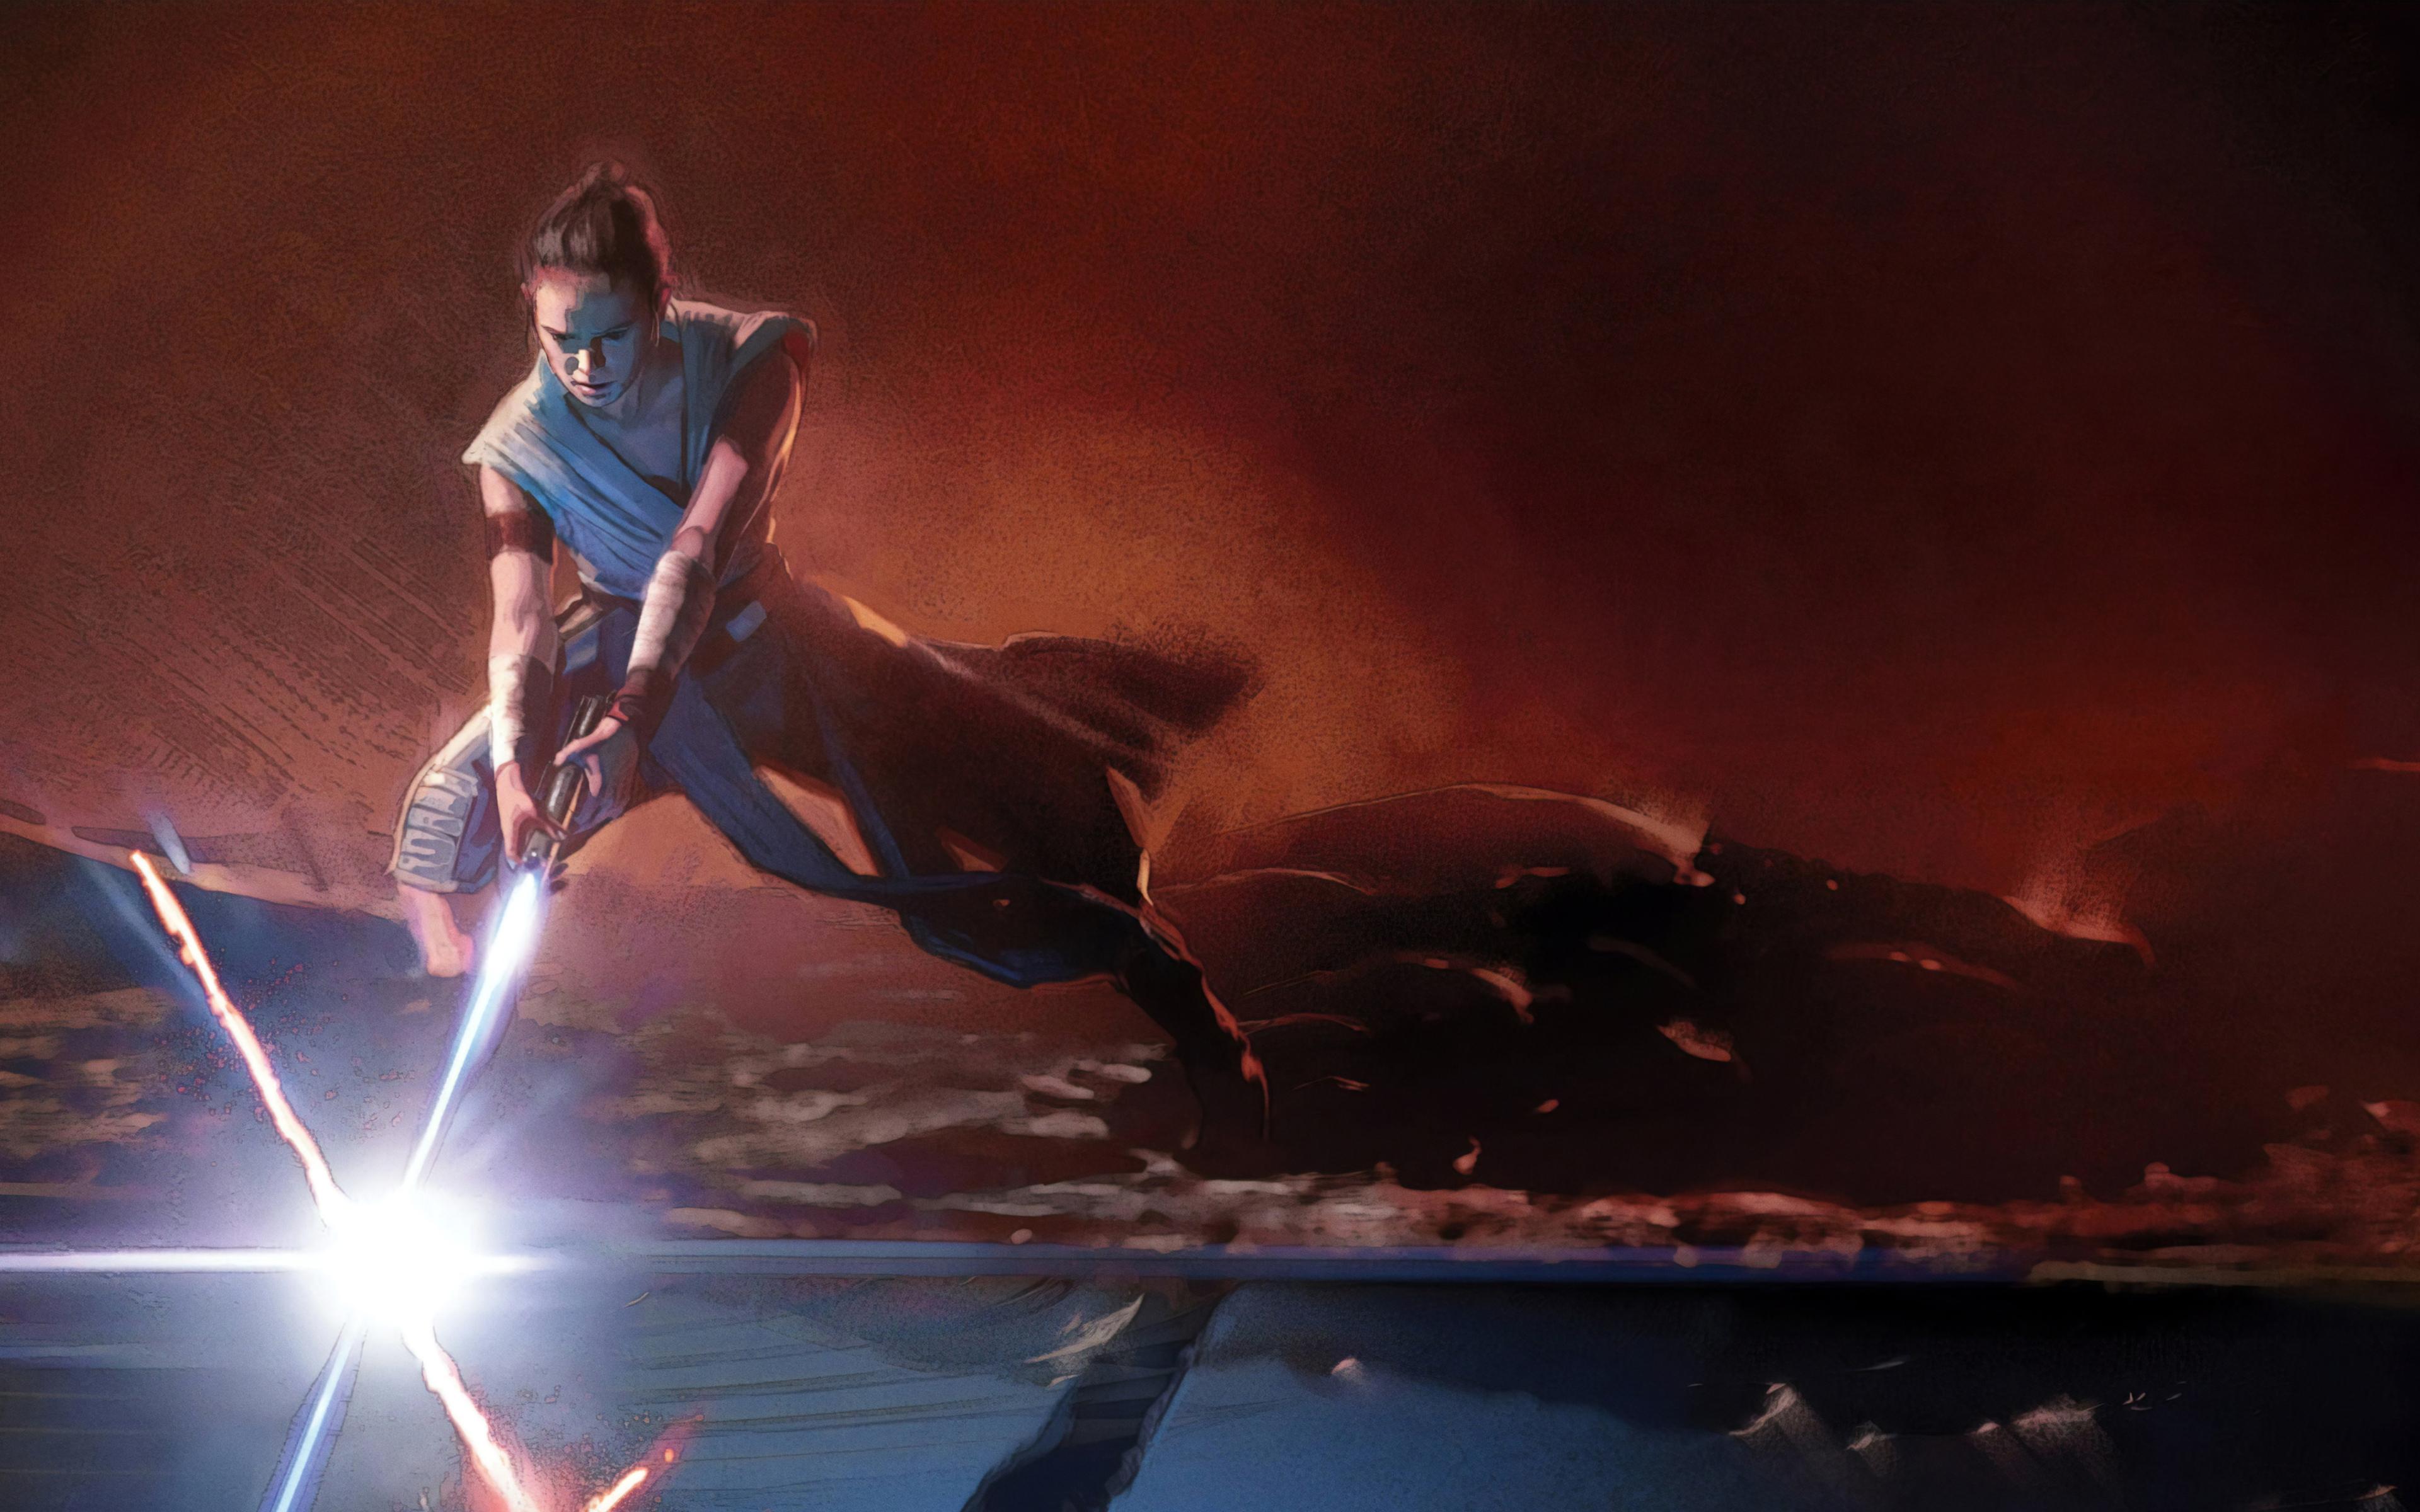 star-wars-the-rise-of-skywalker-2019-poster-hf.jpg